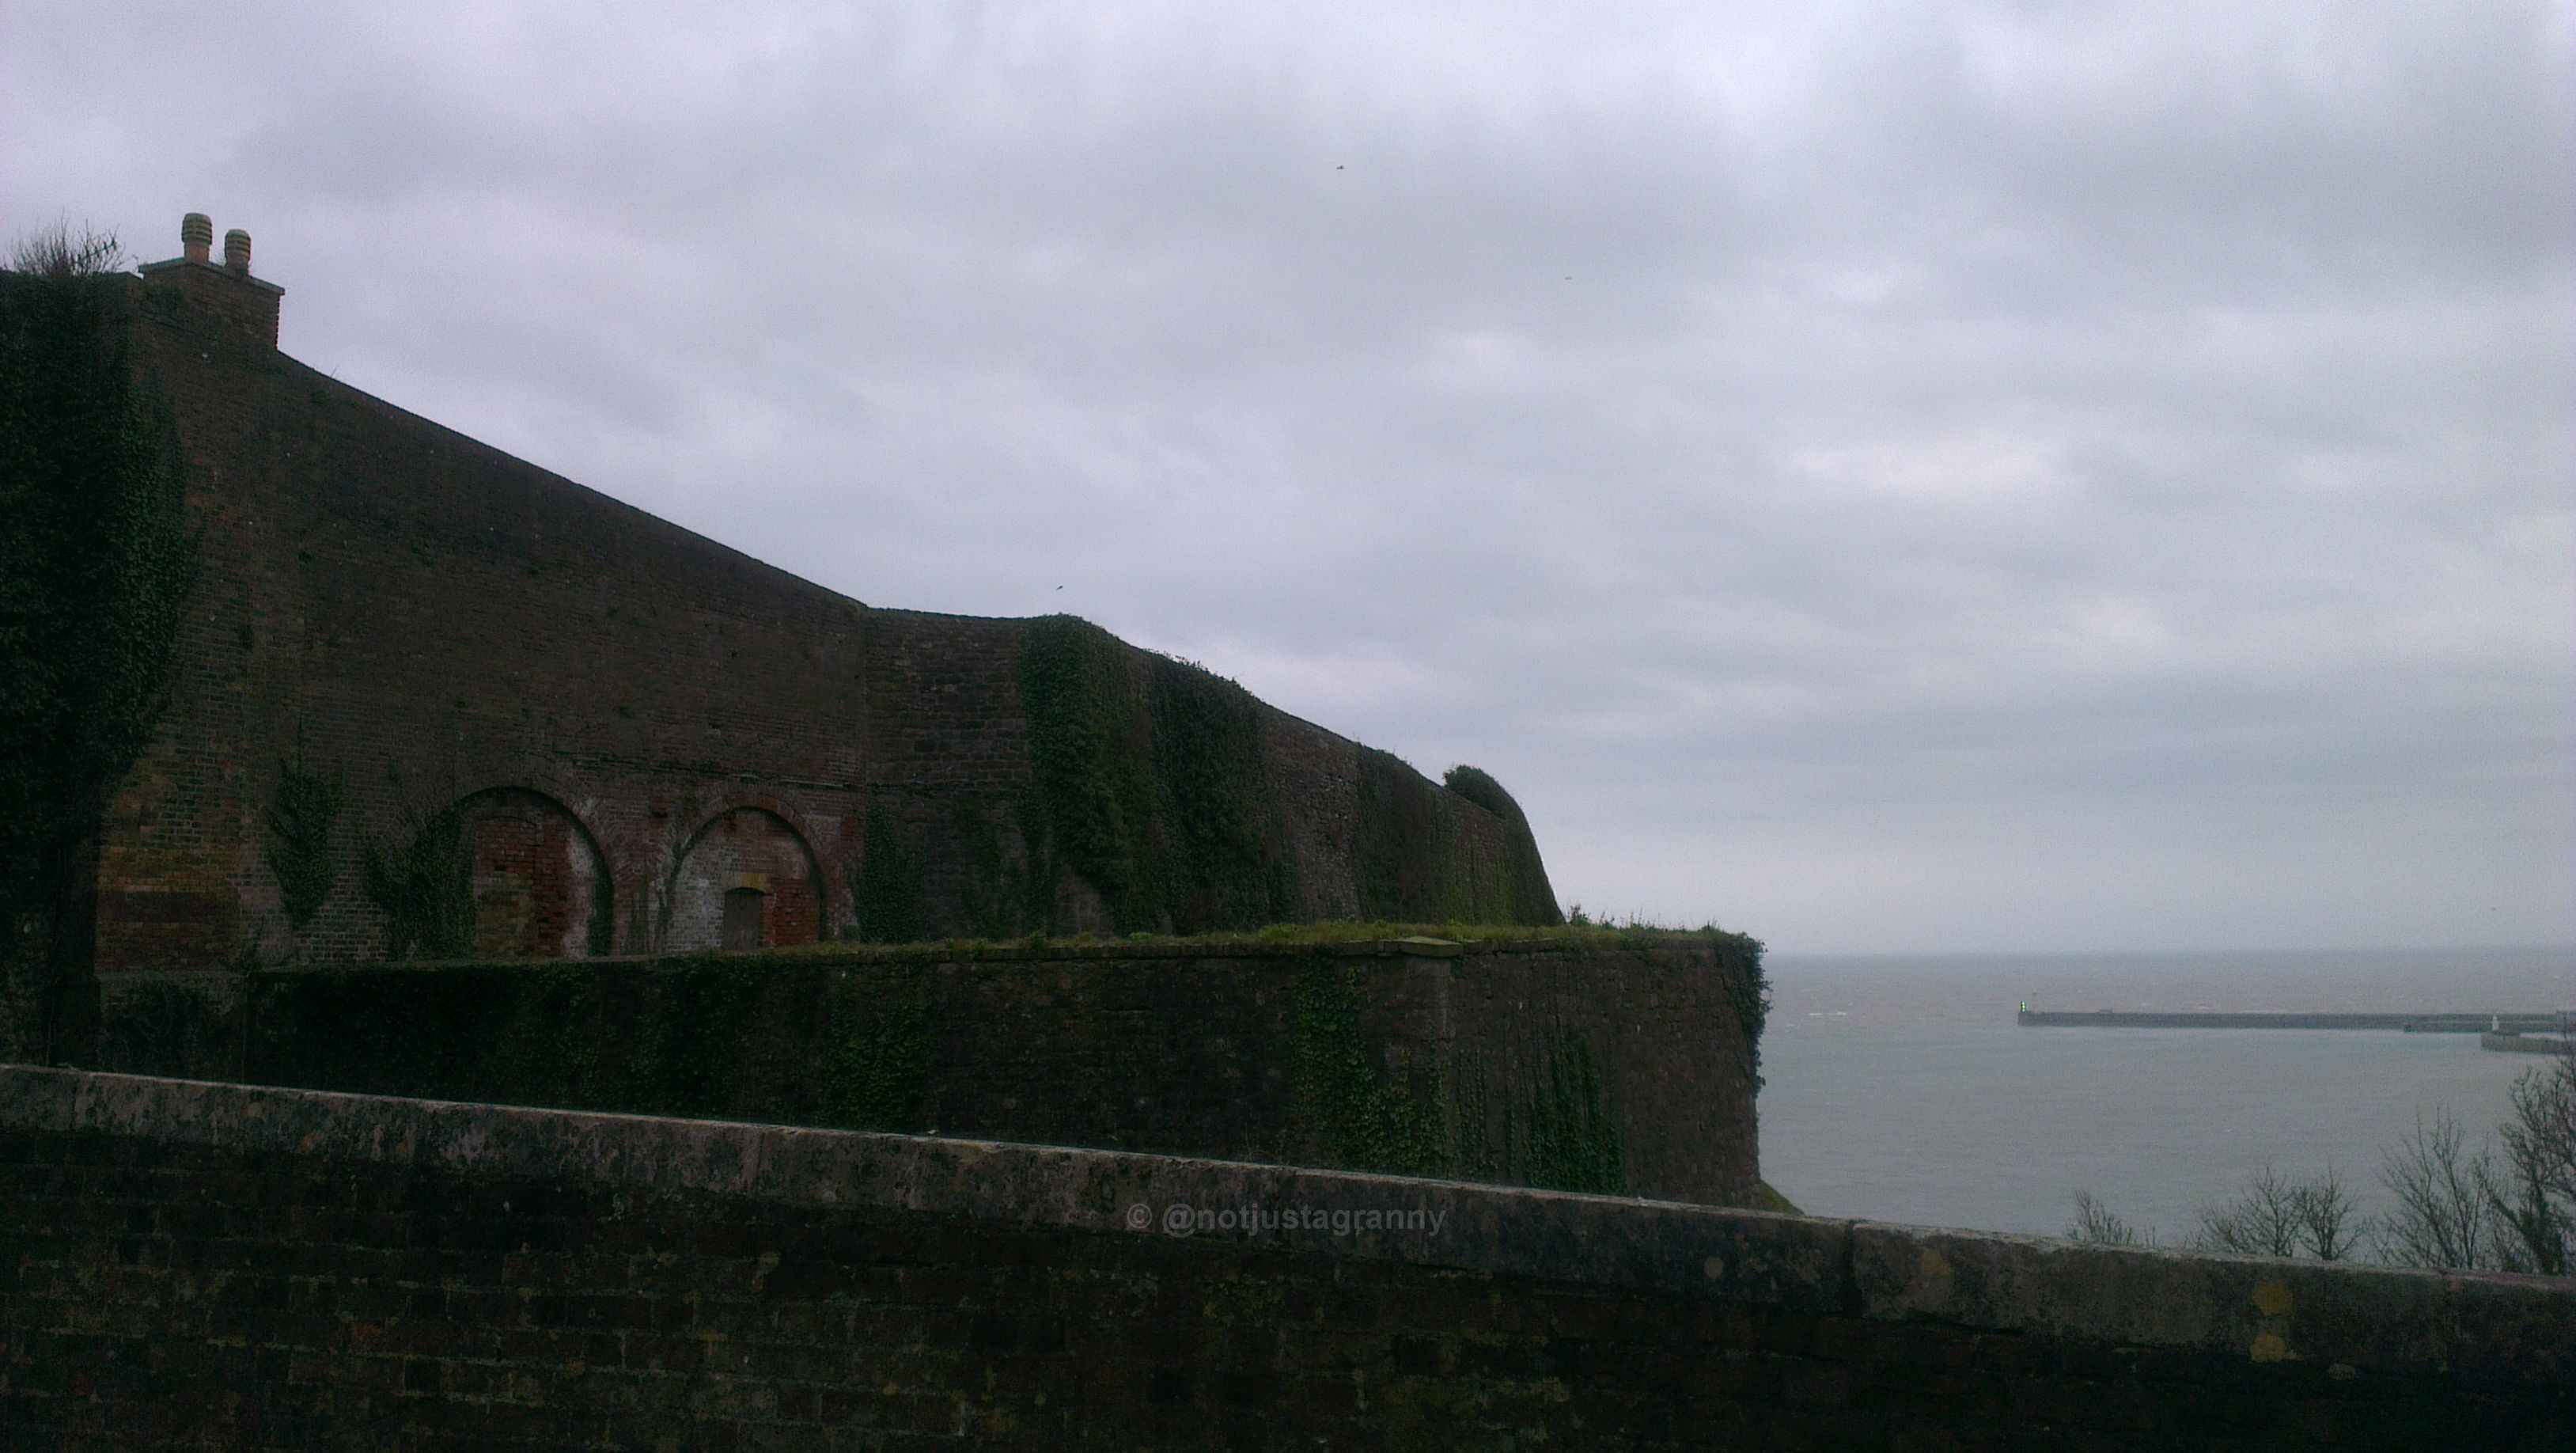 IMAG0753 - dover castle